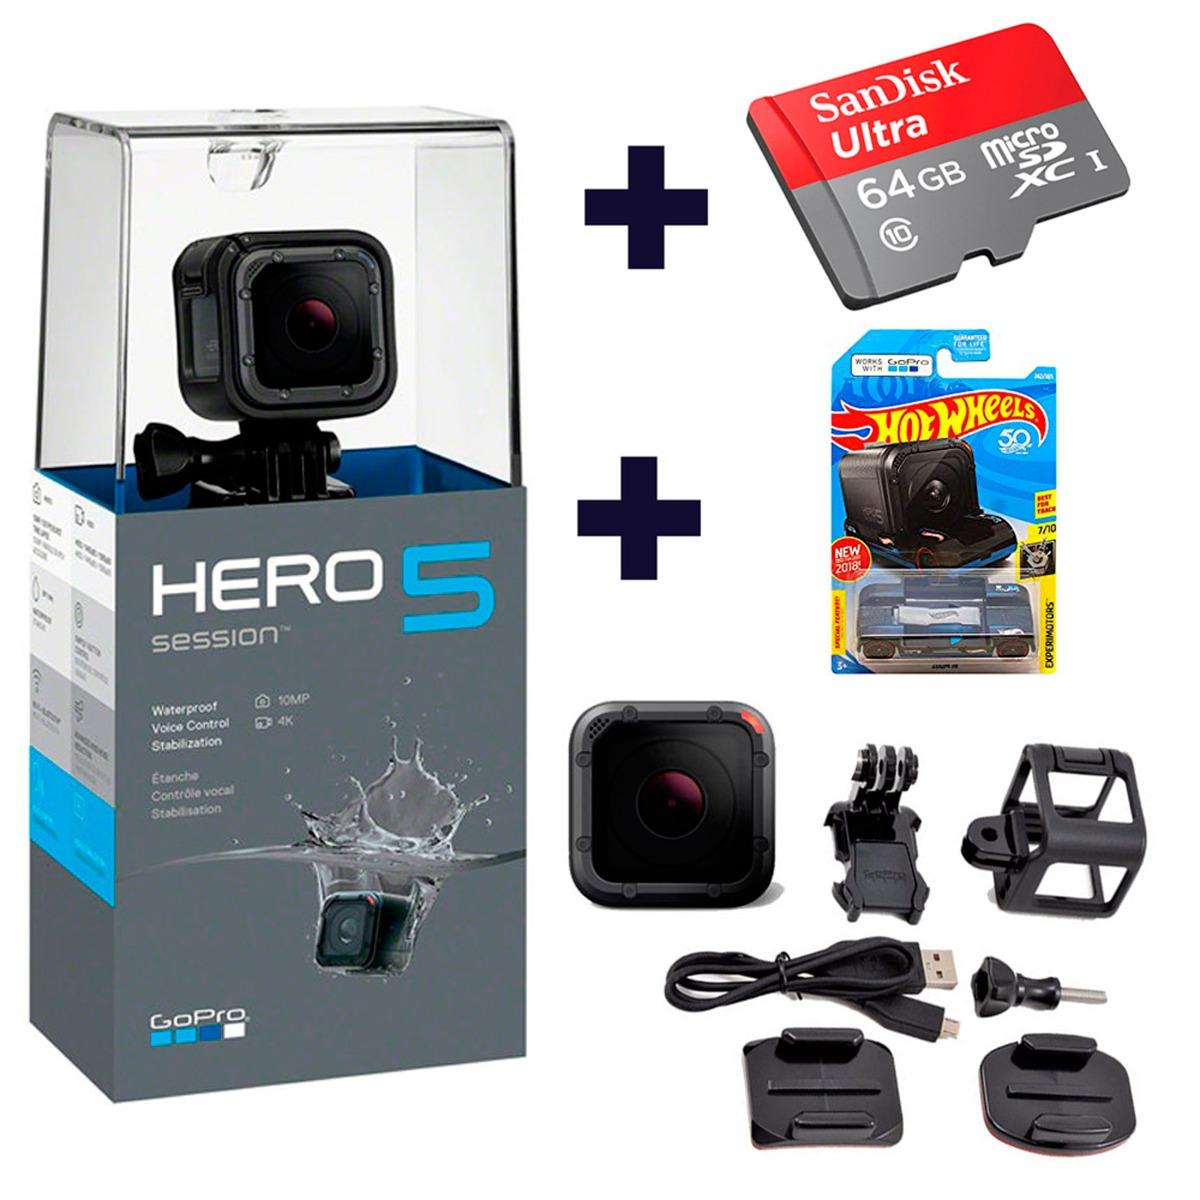 Camara Gopro Hero 5 60fps 1080p, 4k, Mem  64gb Y Hot Wheels